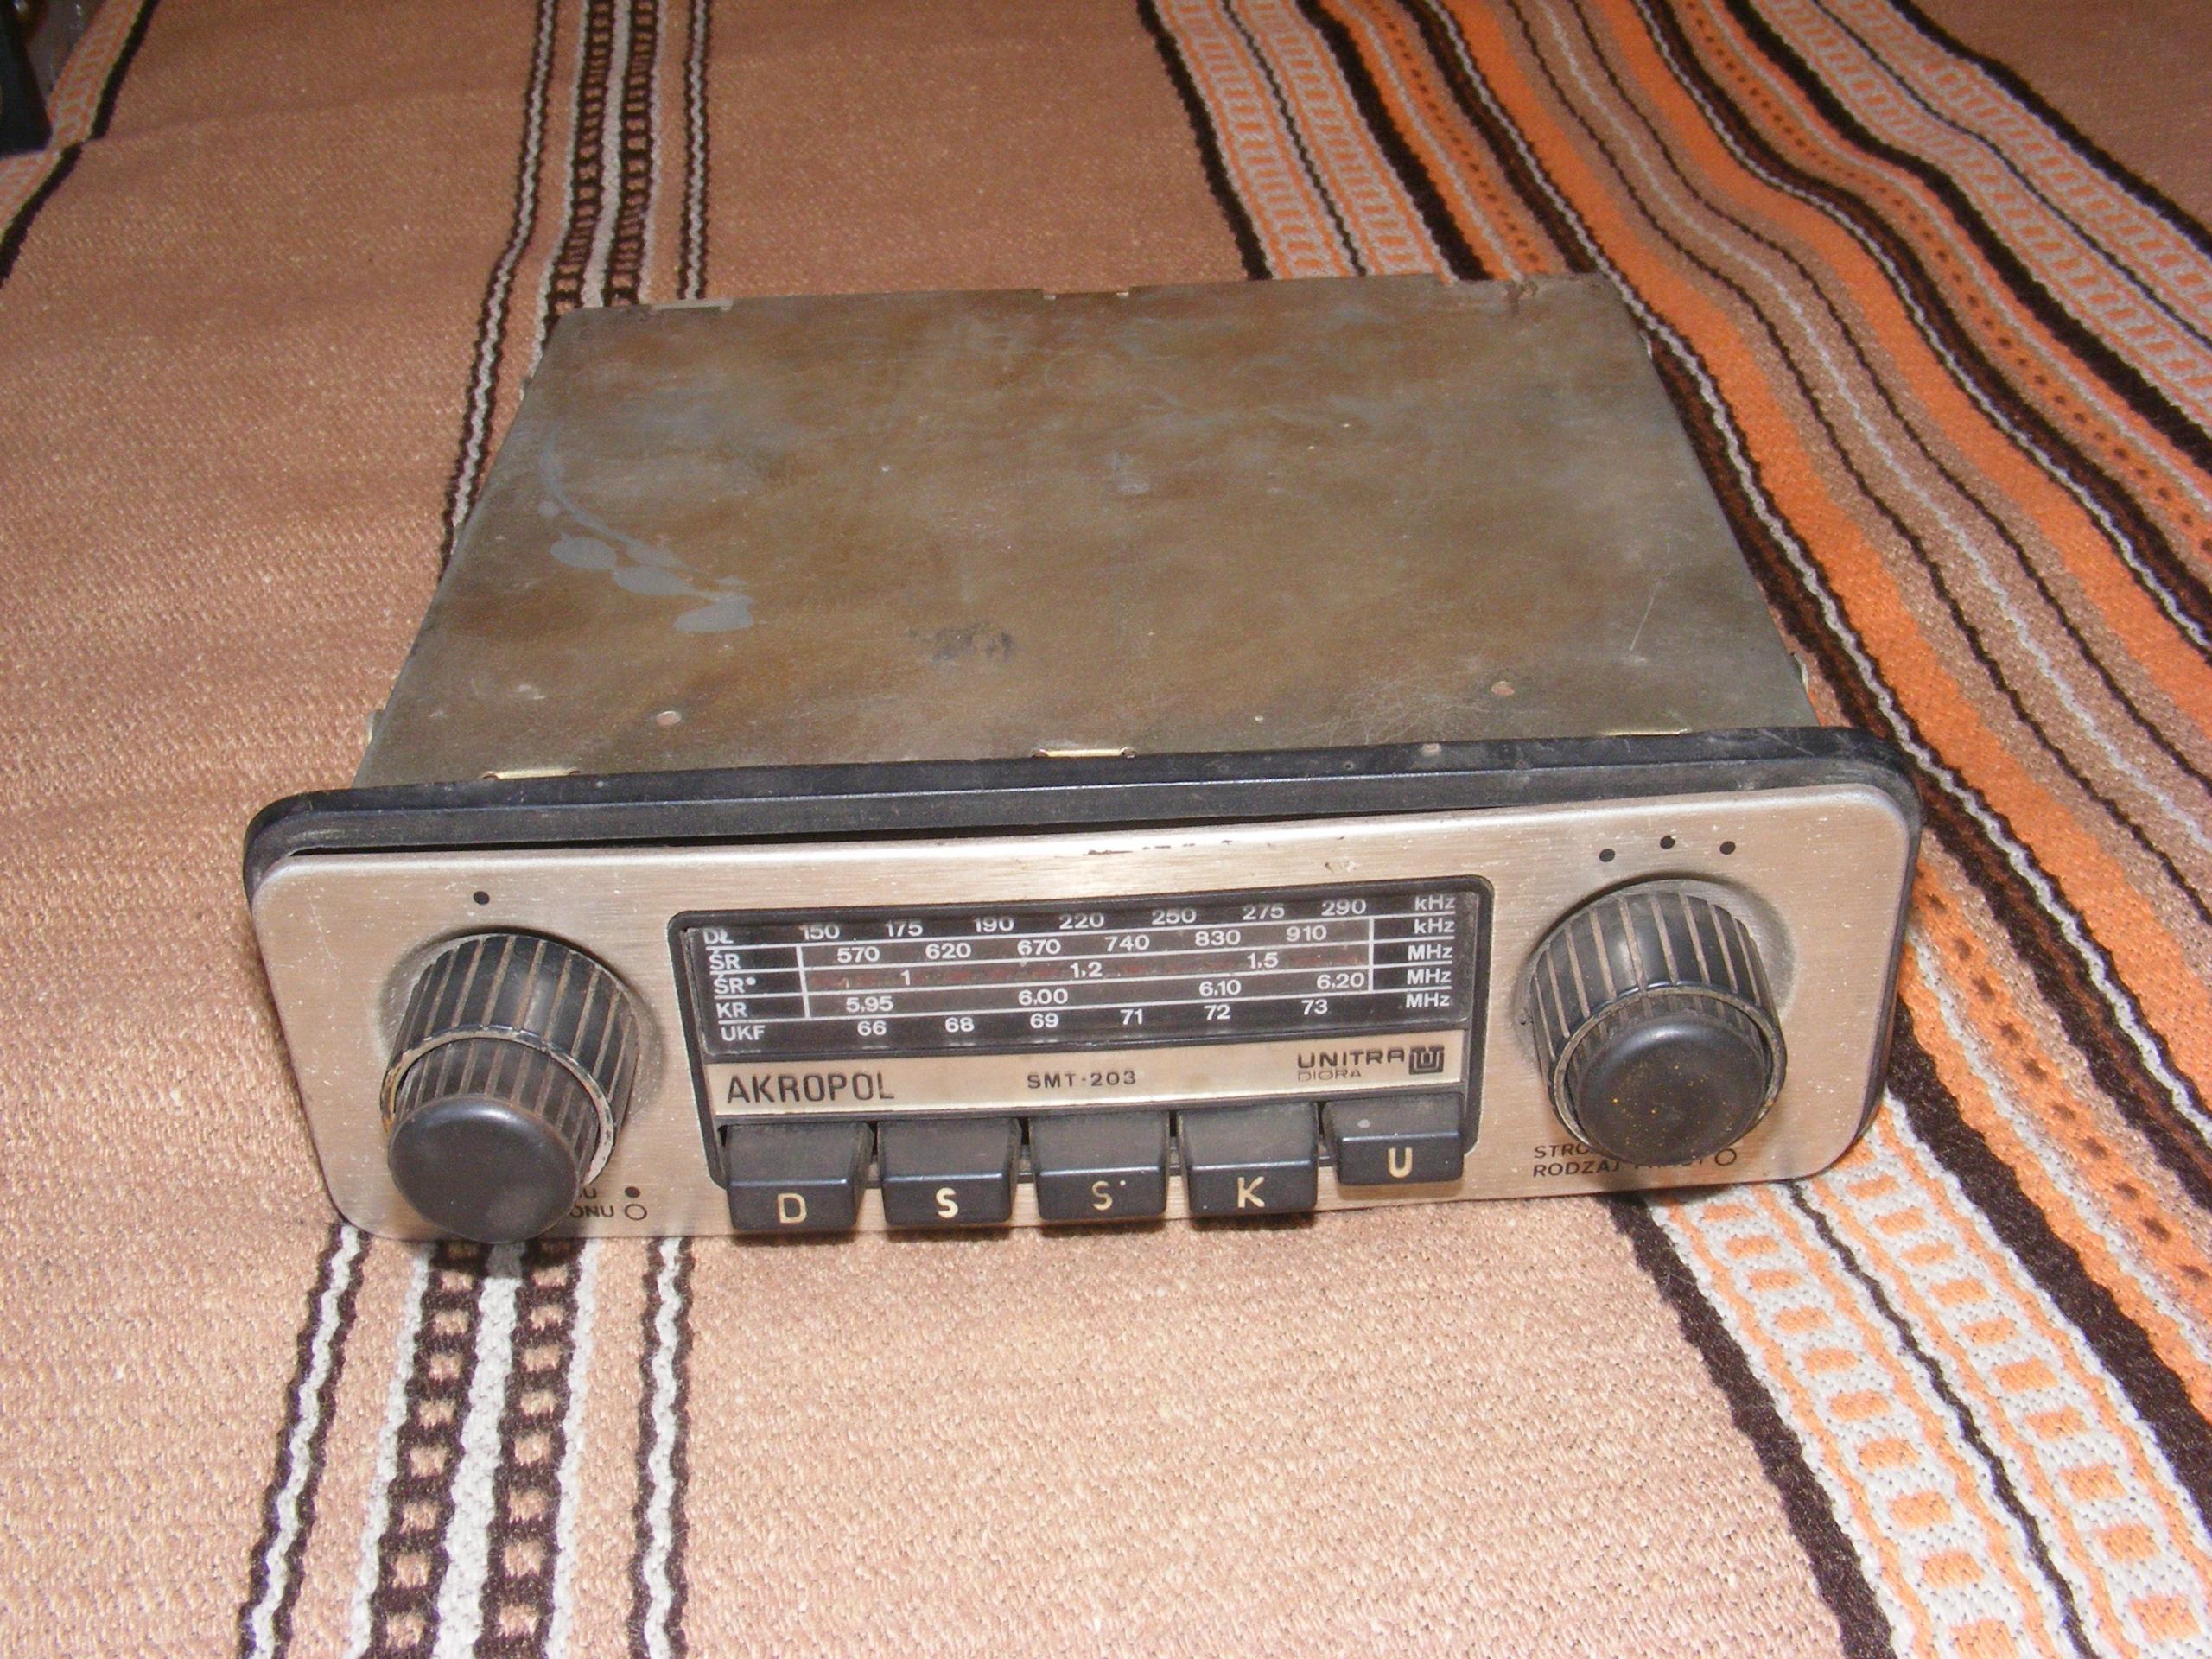 RADIO AKROPOL